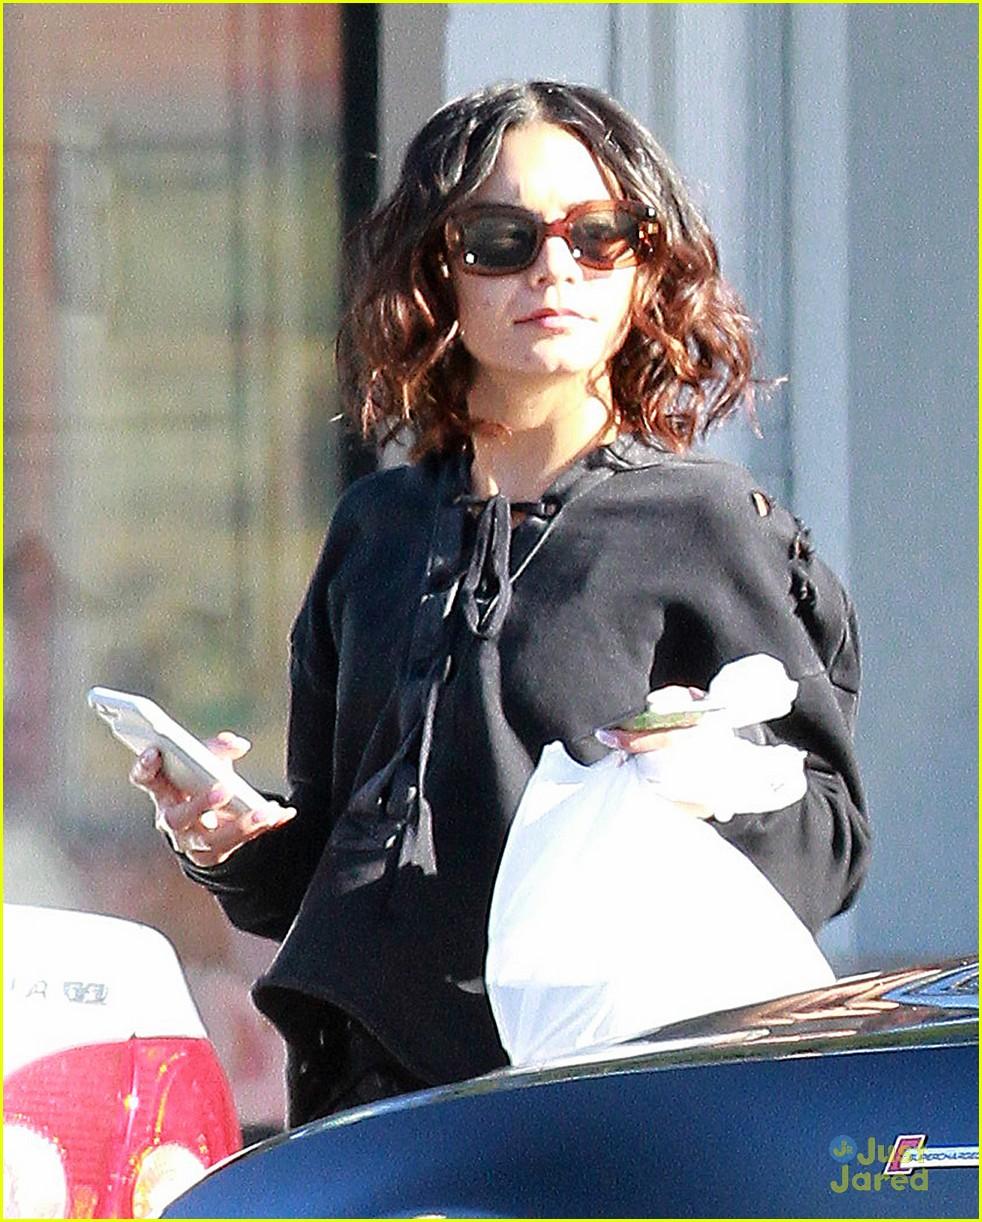 Vanessa Hudgens Books New Movie Role in 'The Pre-Nup ... Vanessa Hudgens Movies